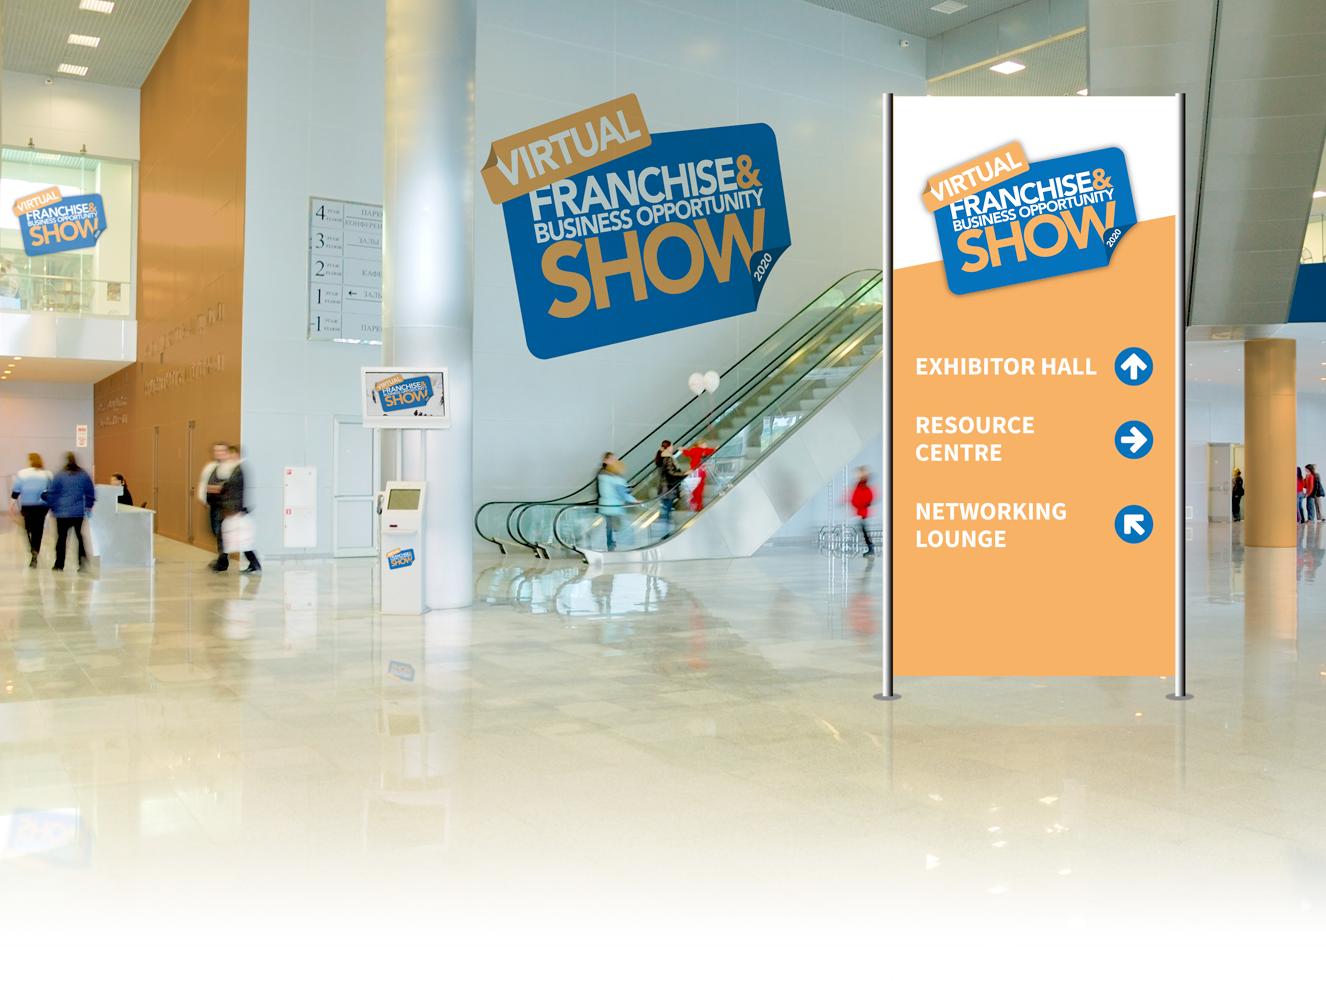 Virtual Show Entrance Hall